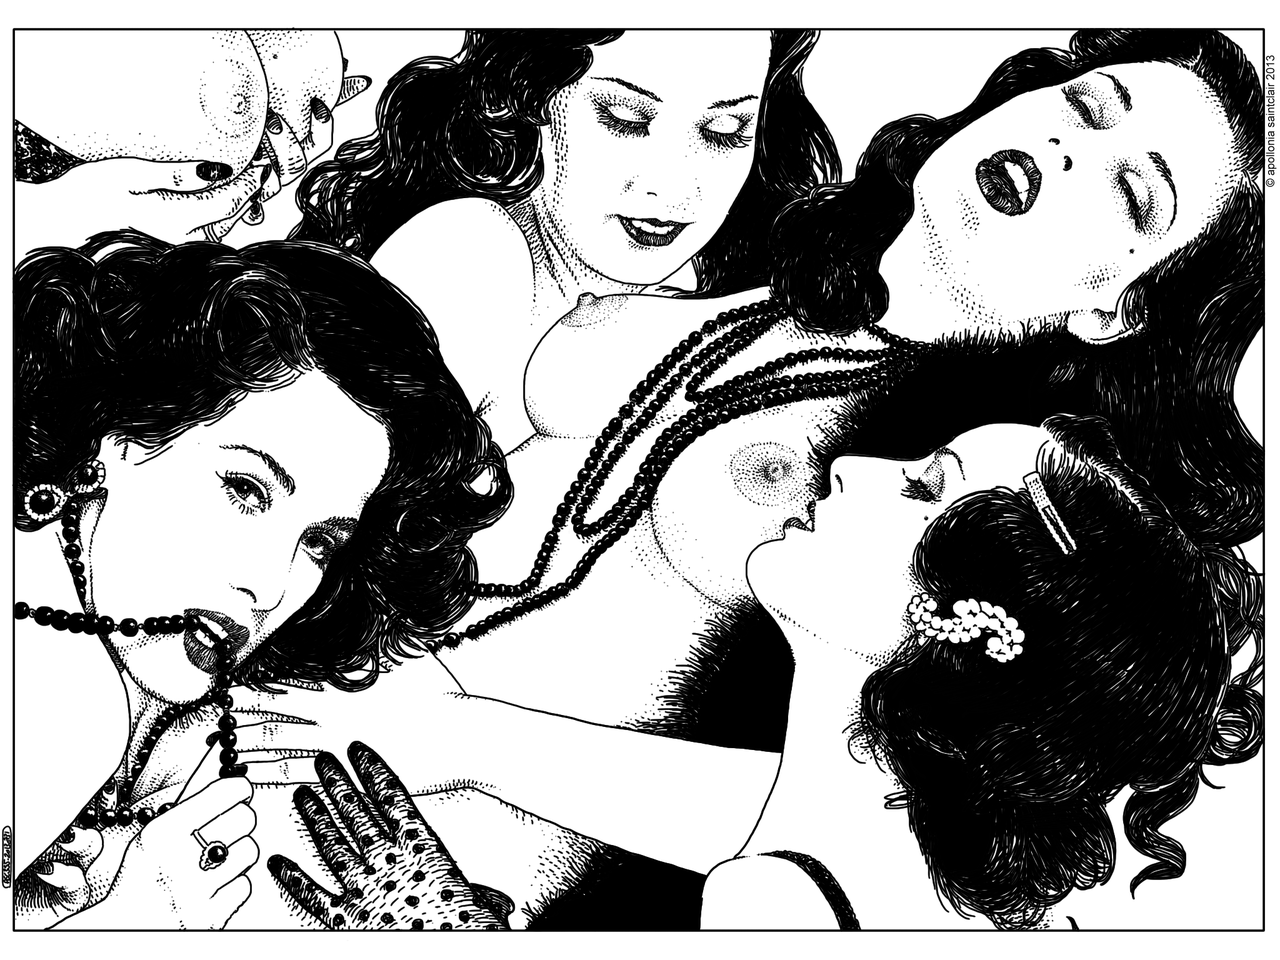 Apollonia Saintclair's Seduction: tumblr_mqtrefagRQ1rojfyfo1_1280.png